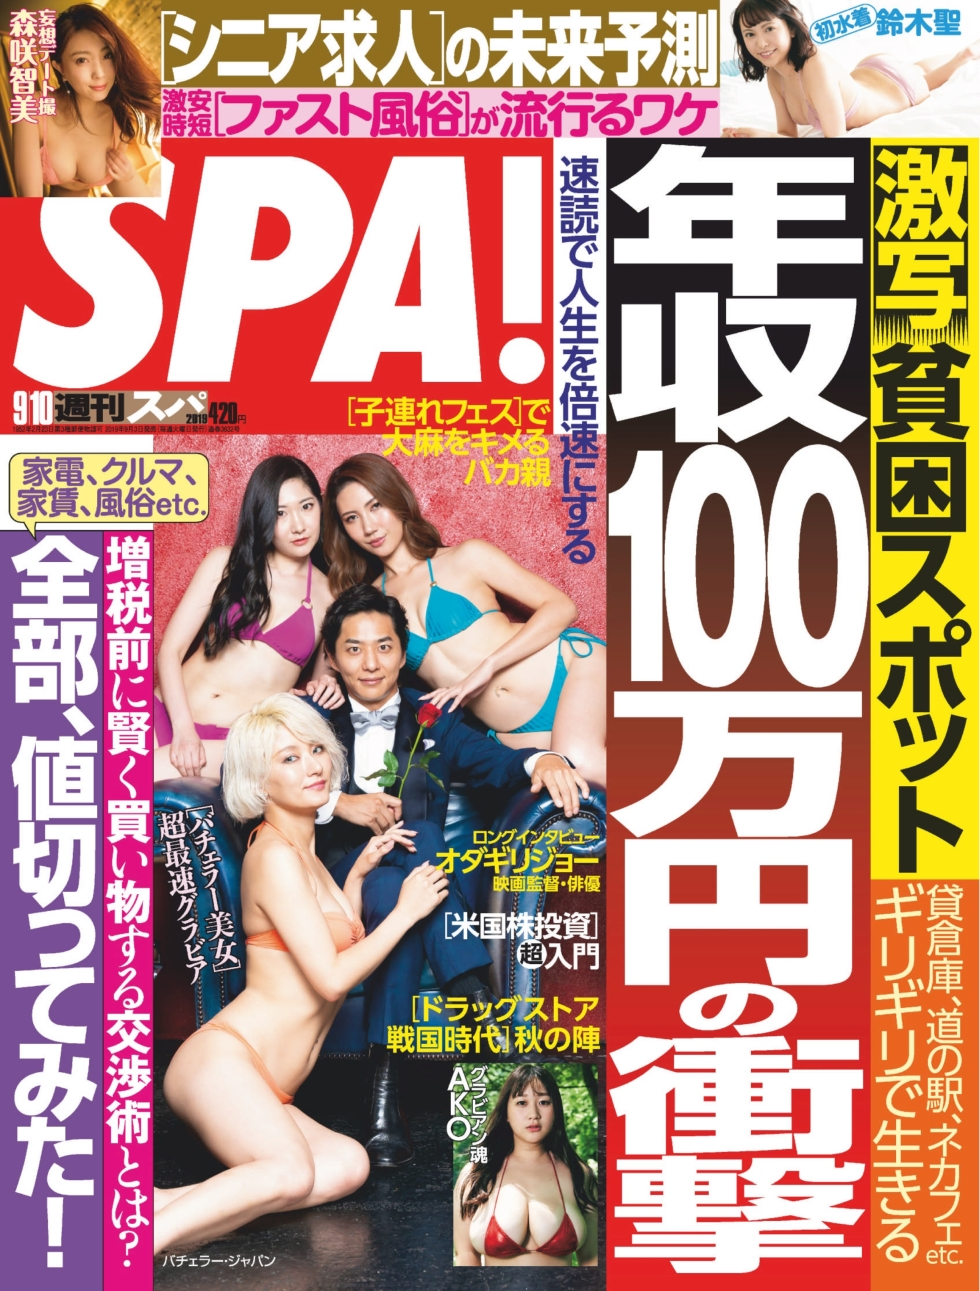 �L刊SPA!9/10号 - 第1张  | 性趣套图